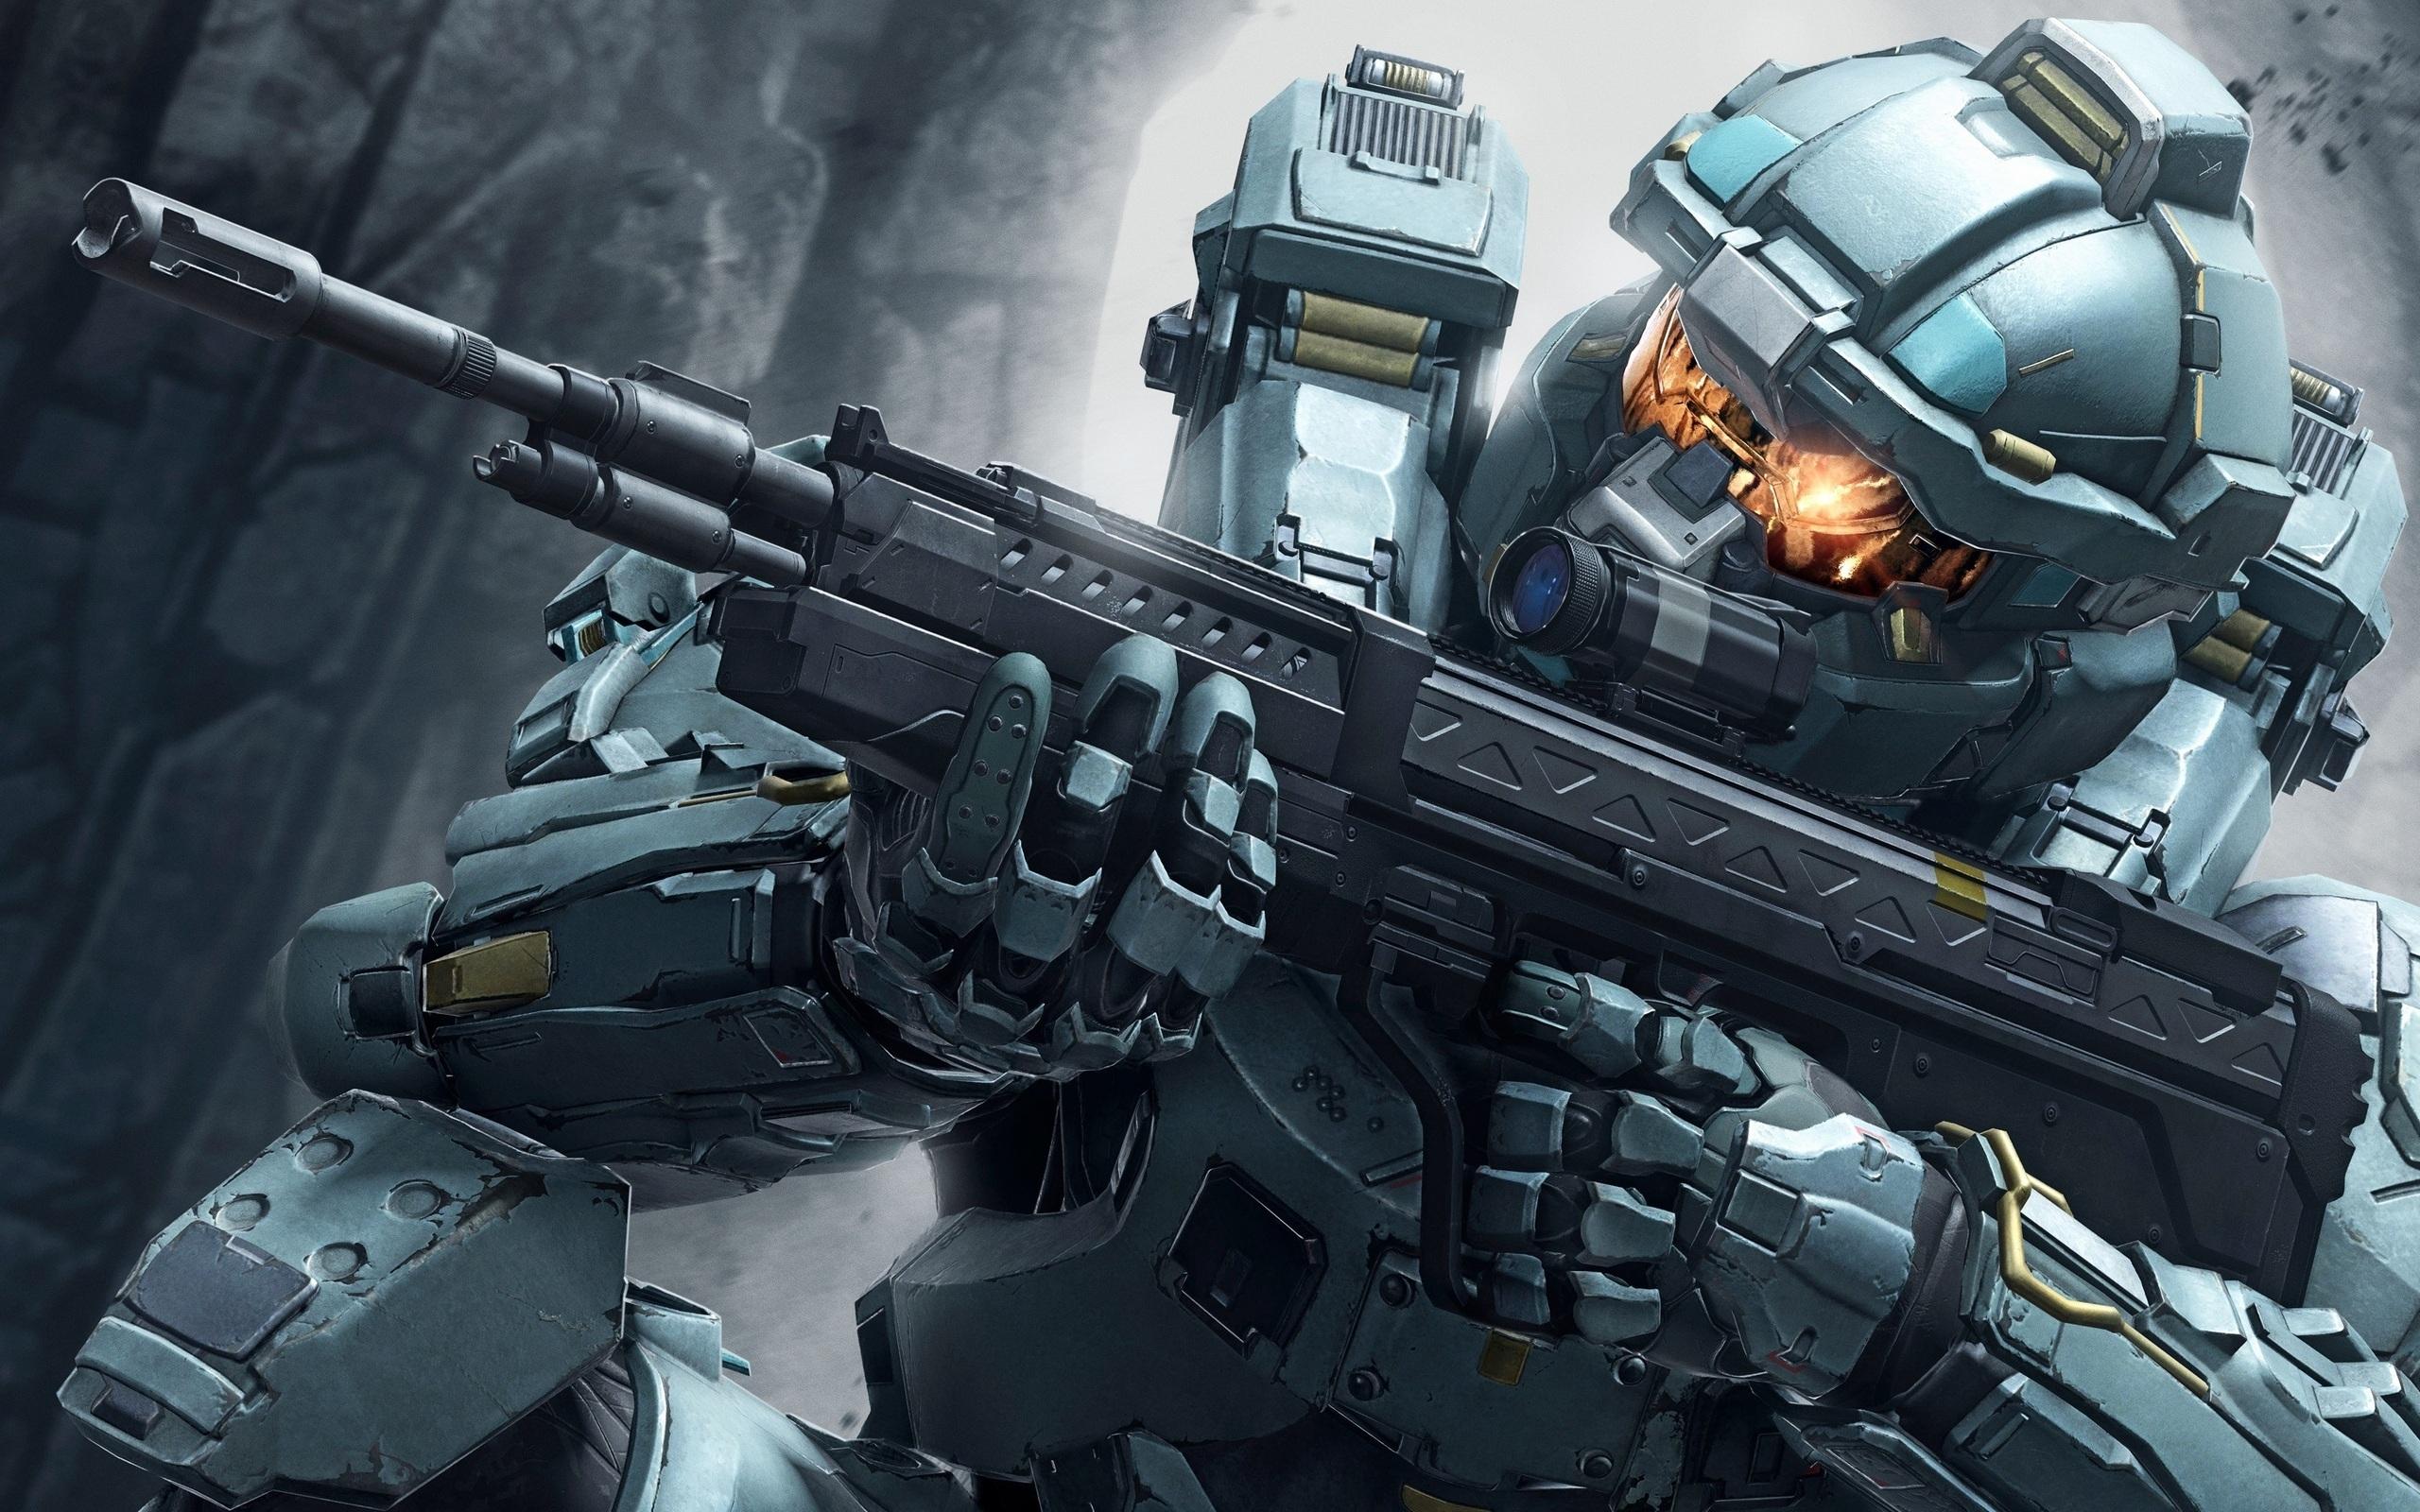 Halo 5 Guardian Hd Wallpaper Wallpaperfx